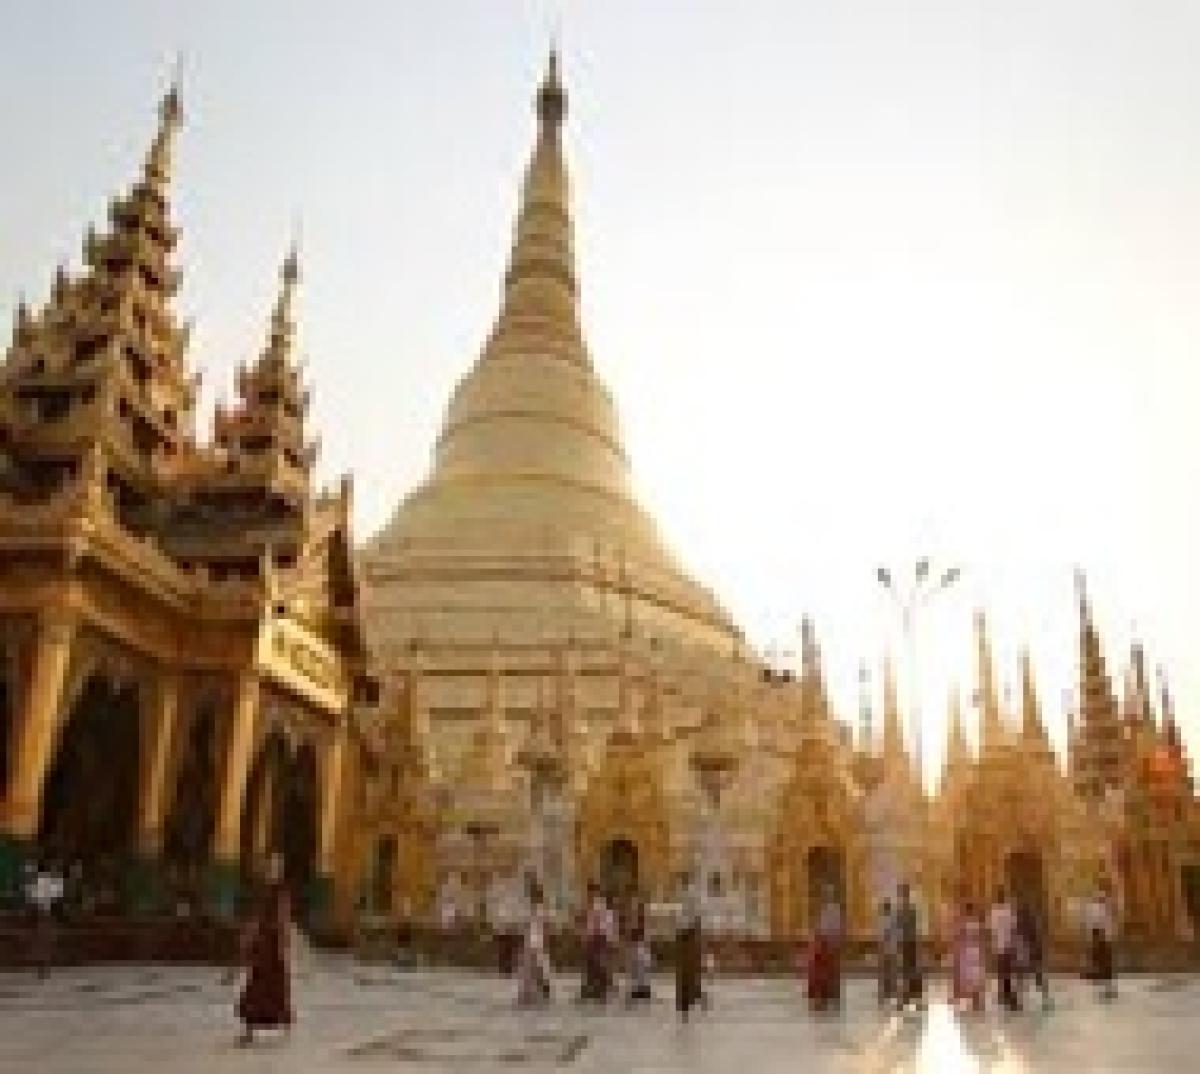 Pagodas damaged, but no casualties in Myanmar quake